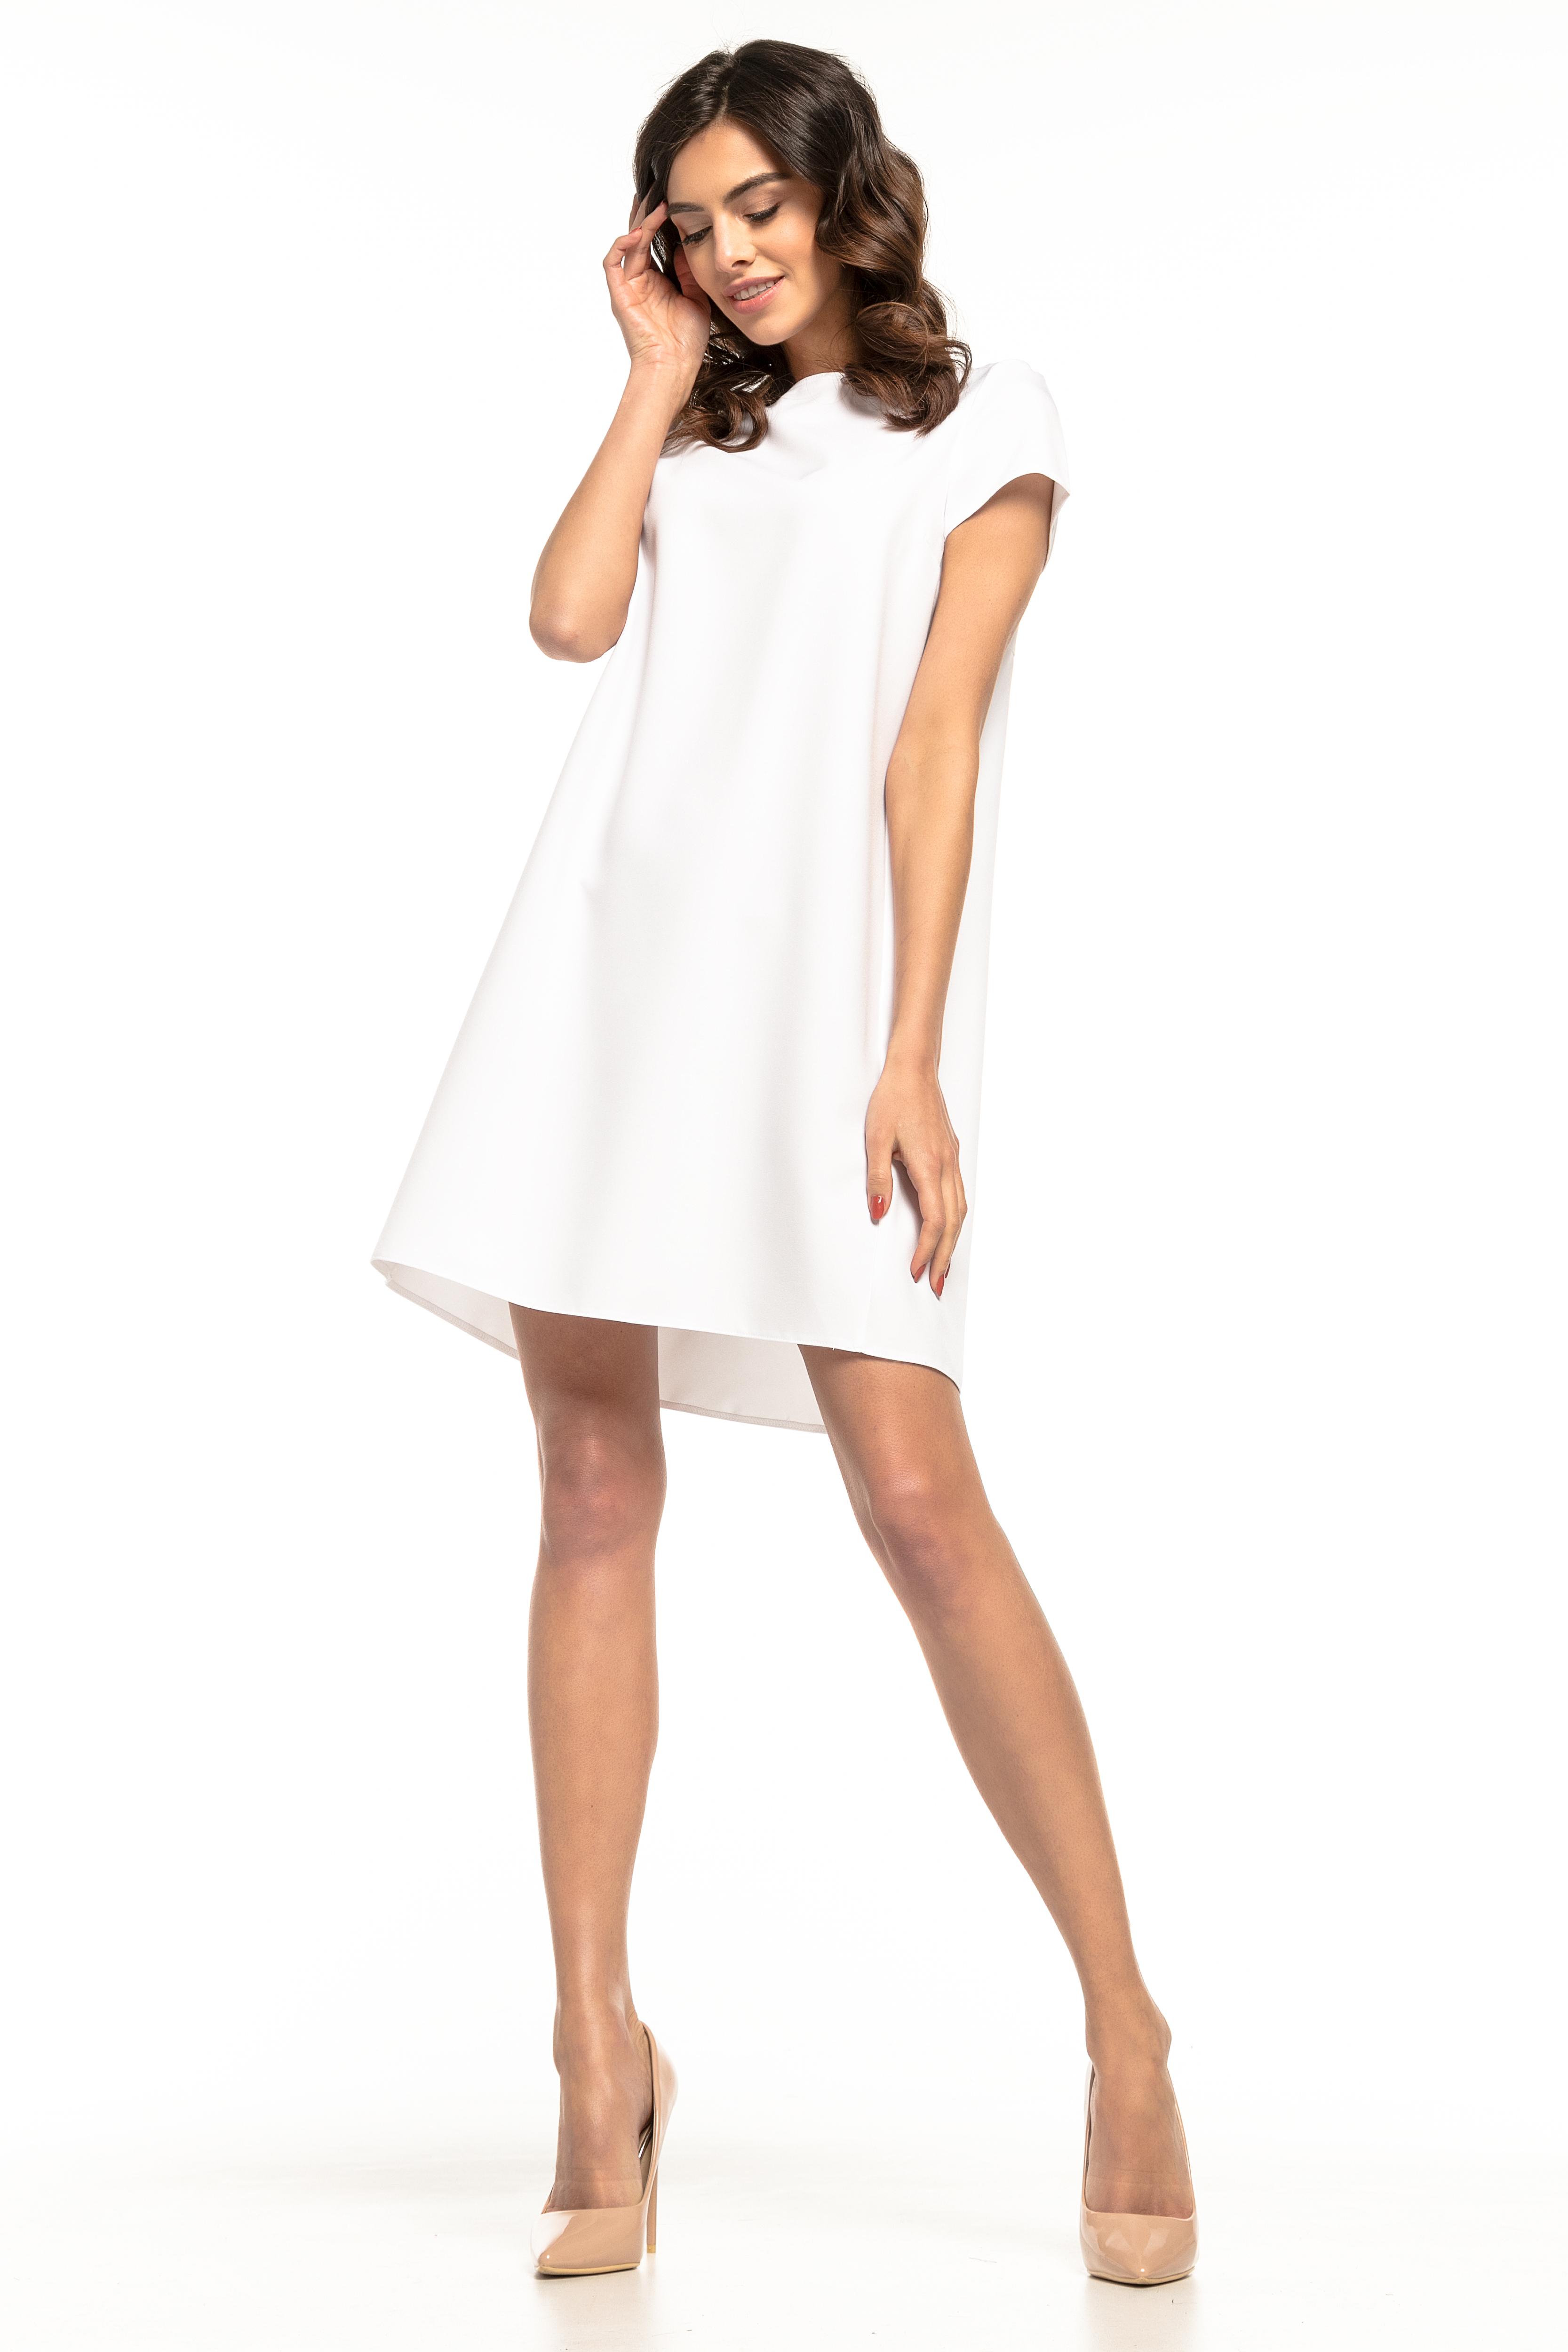 33e9e7cb4e Sukienka trapezowa elegancka biała - tania dostawa już od 5